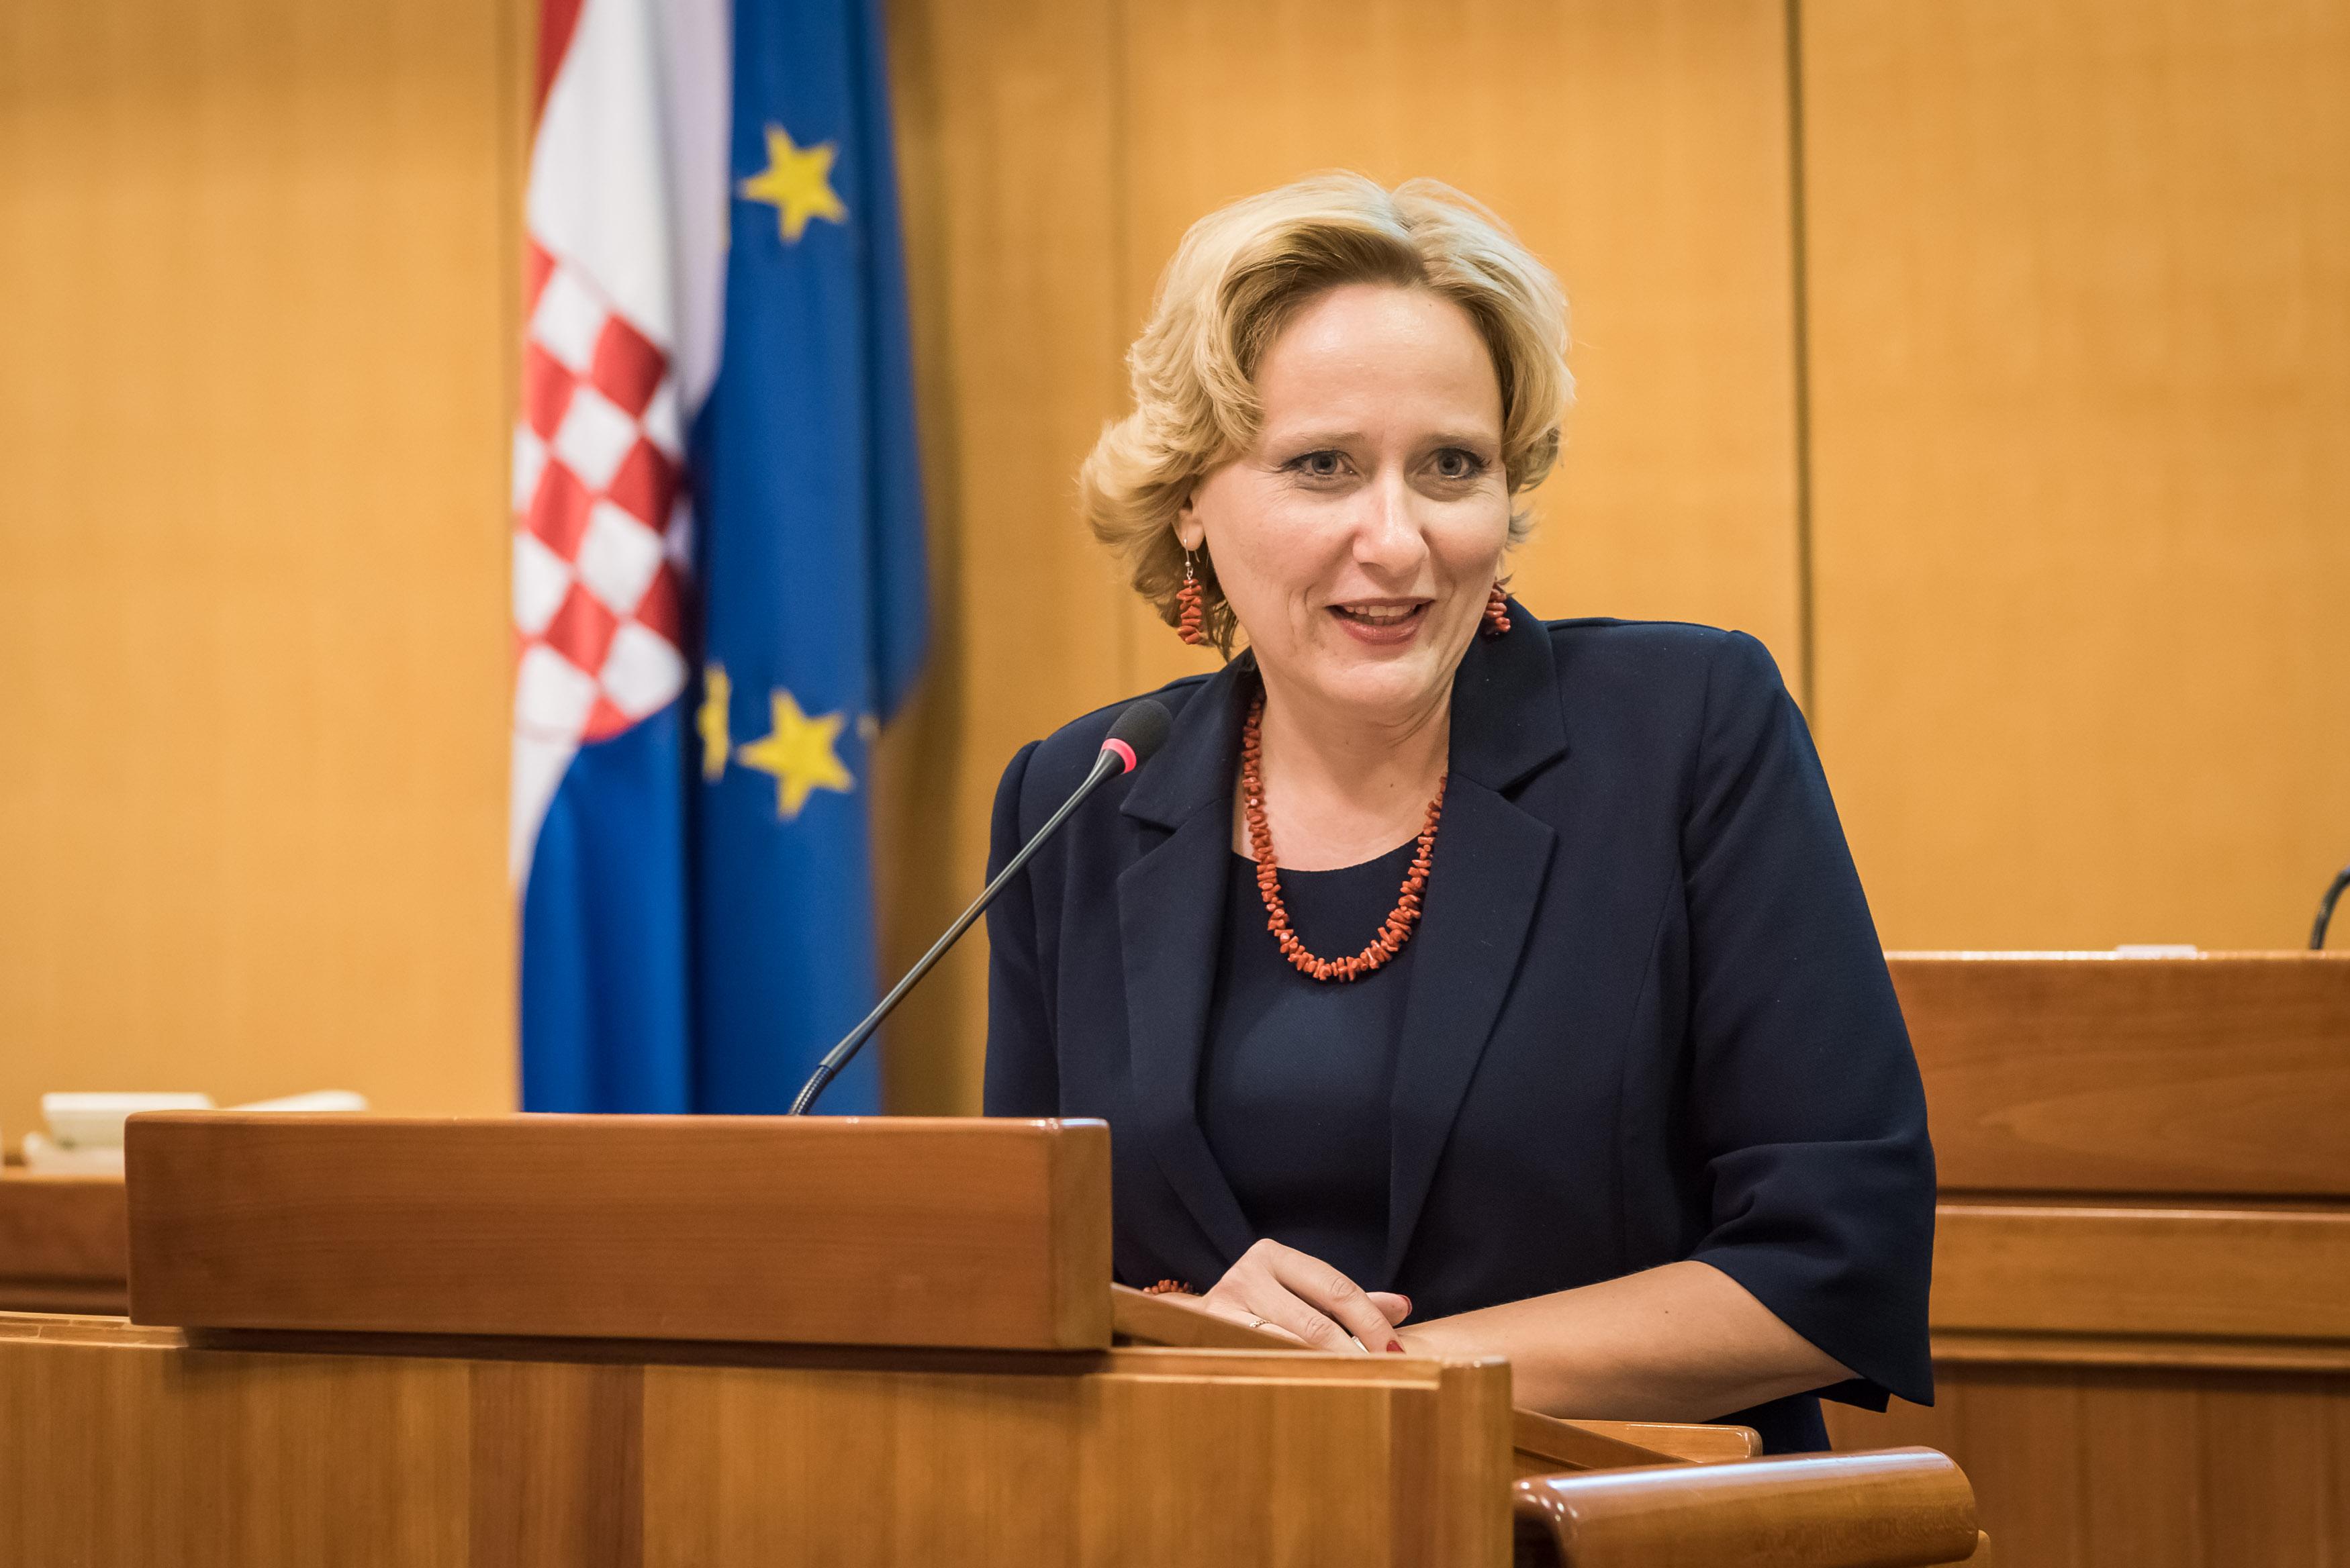 http://ombudsman.hr/images/CRC_5468.jpg